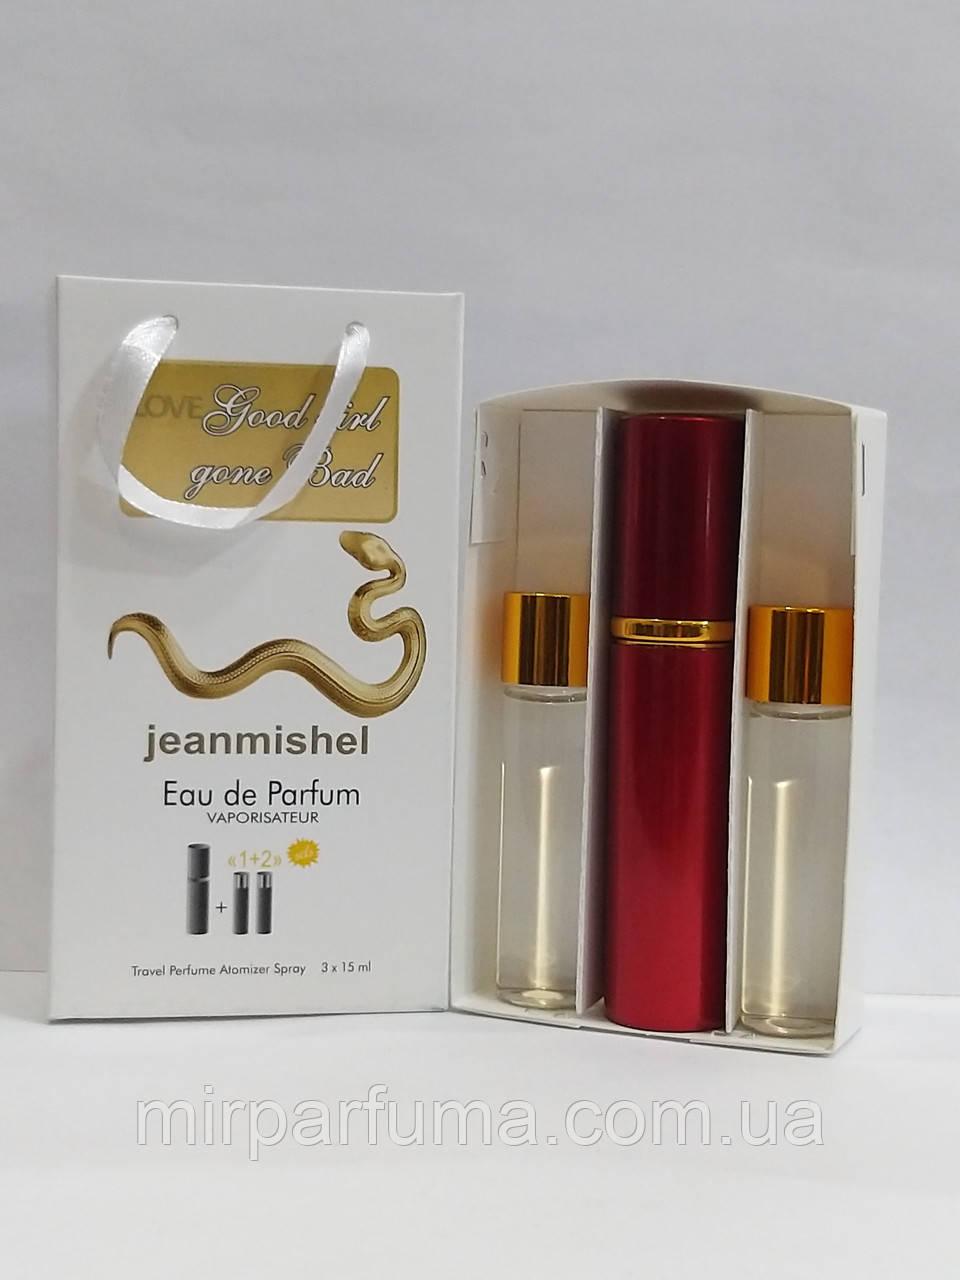 Міні парфум jeanmishel Love Be Delicious Woman 45ml